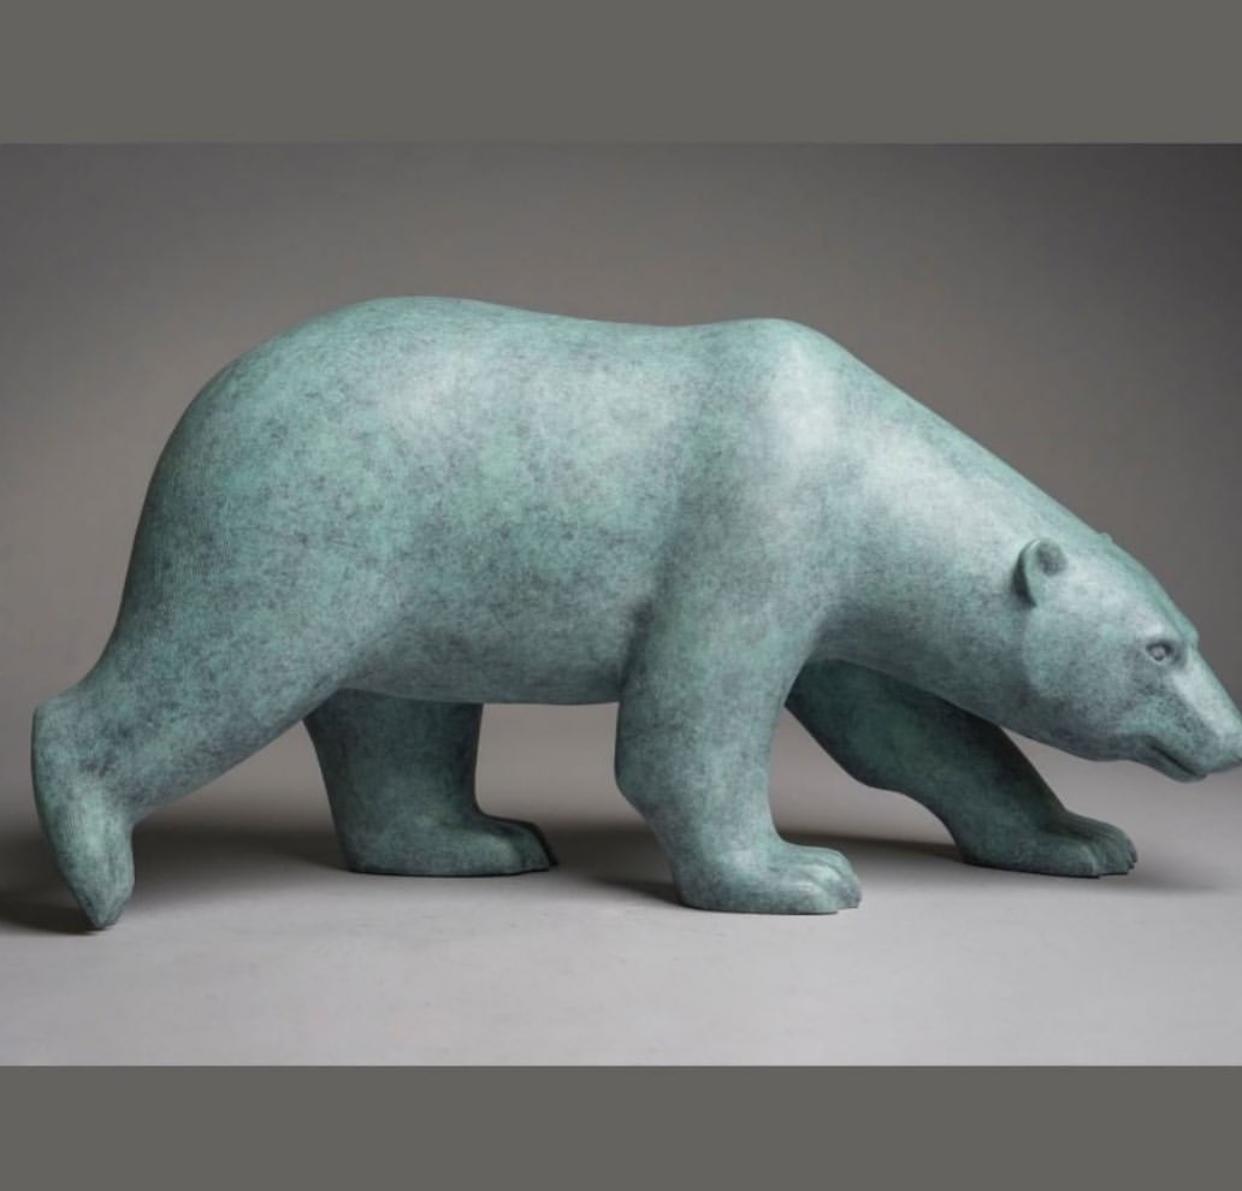 The polar bear bronze statue